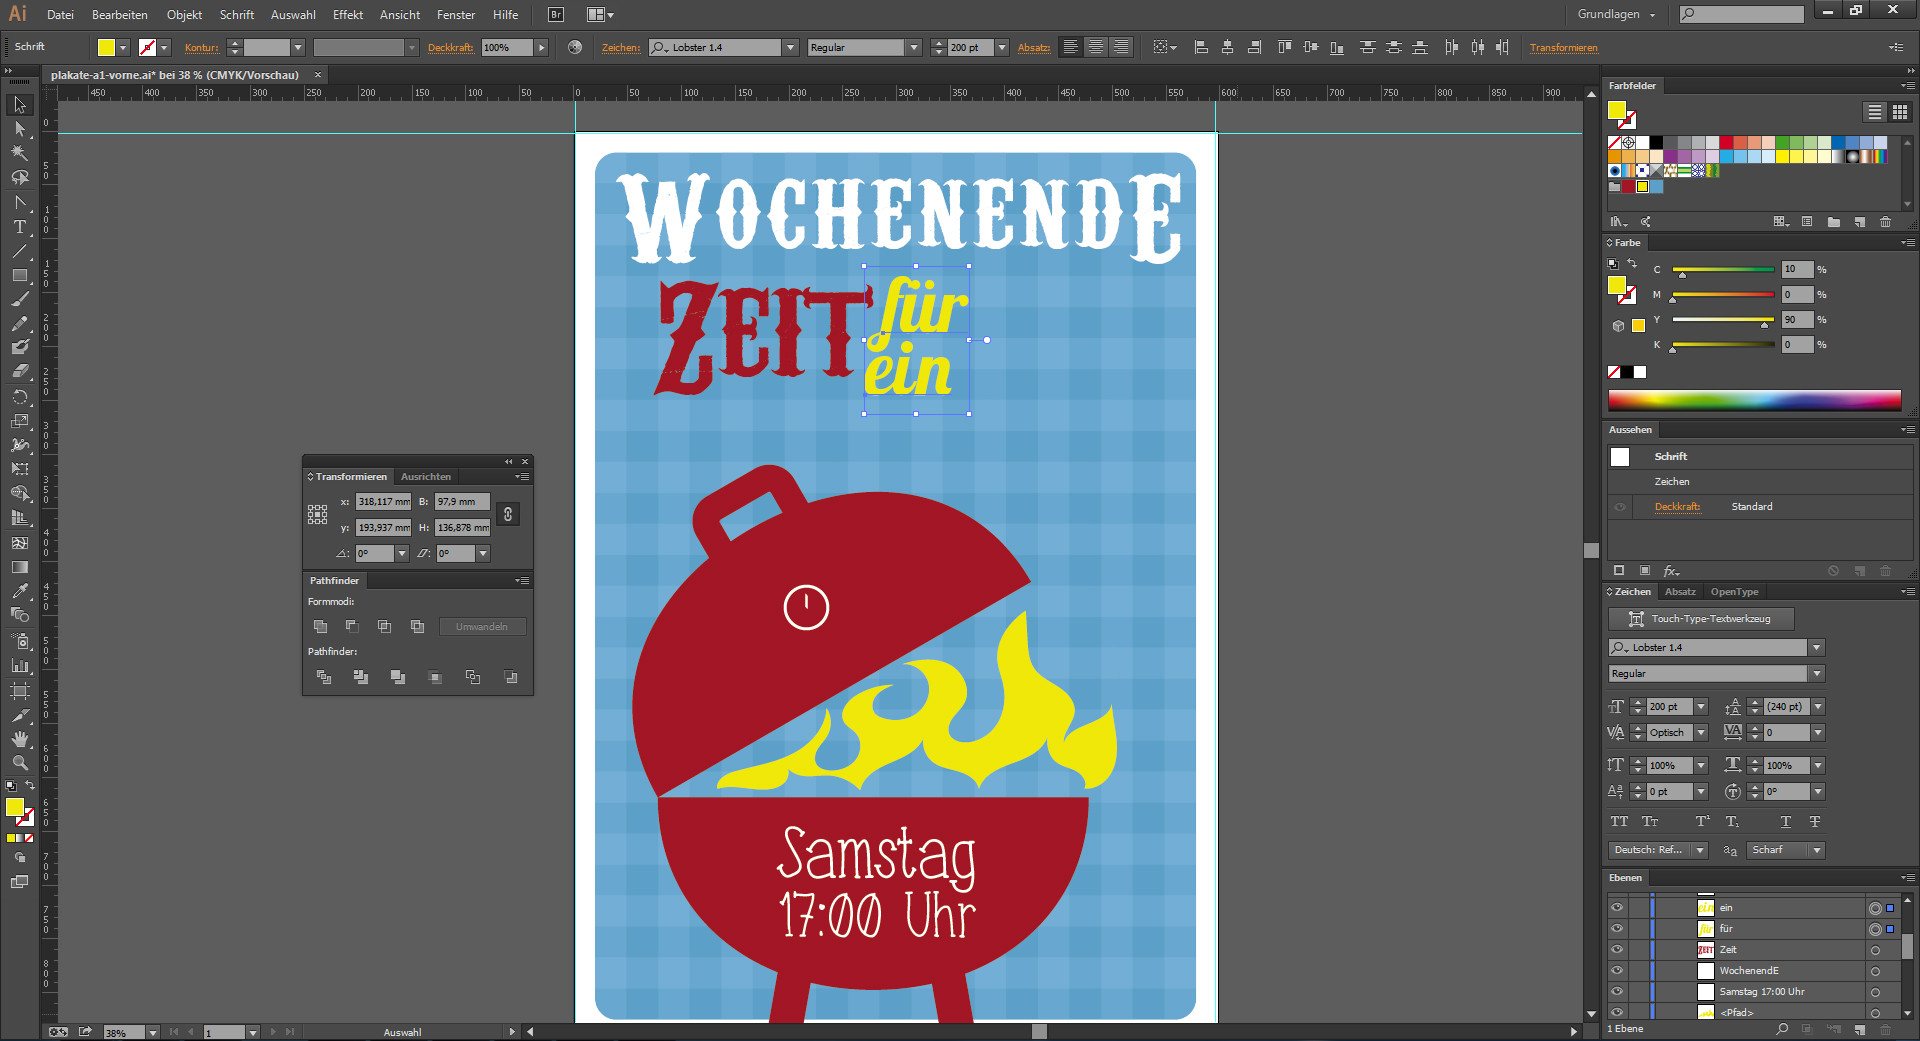 Texteingabe im Programm Illustrator